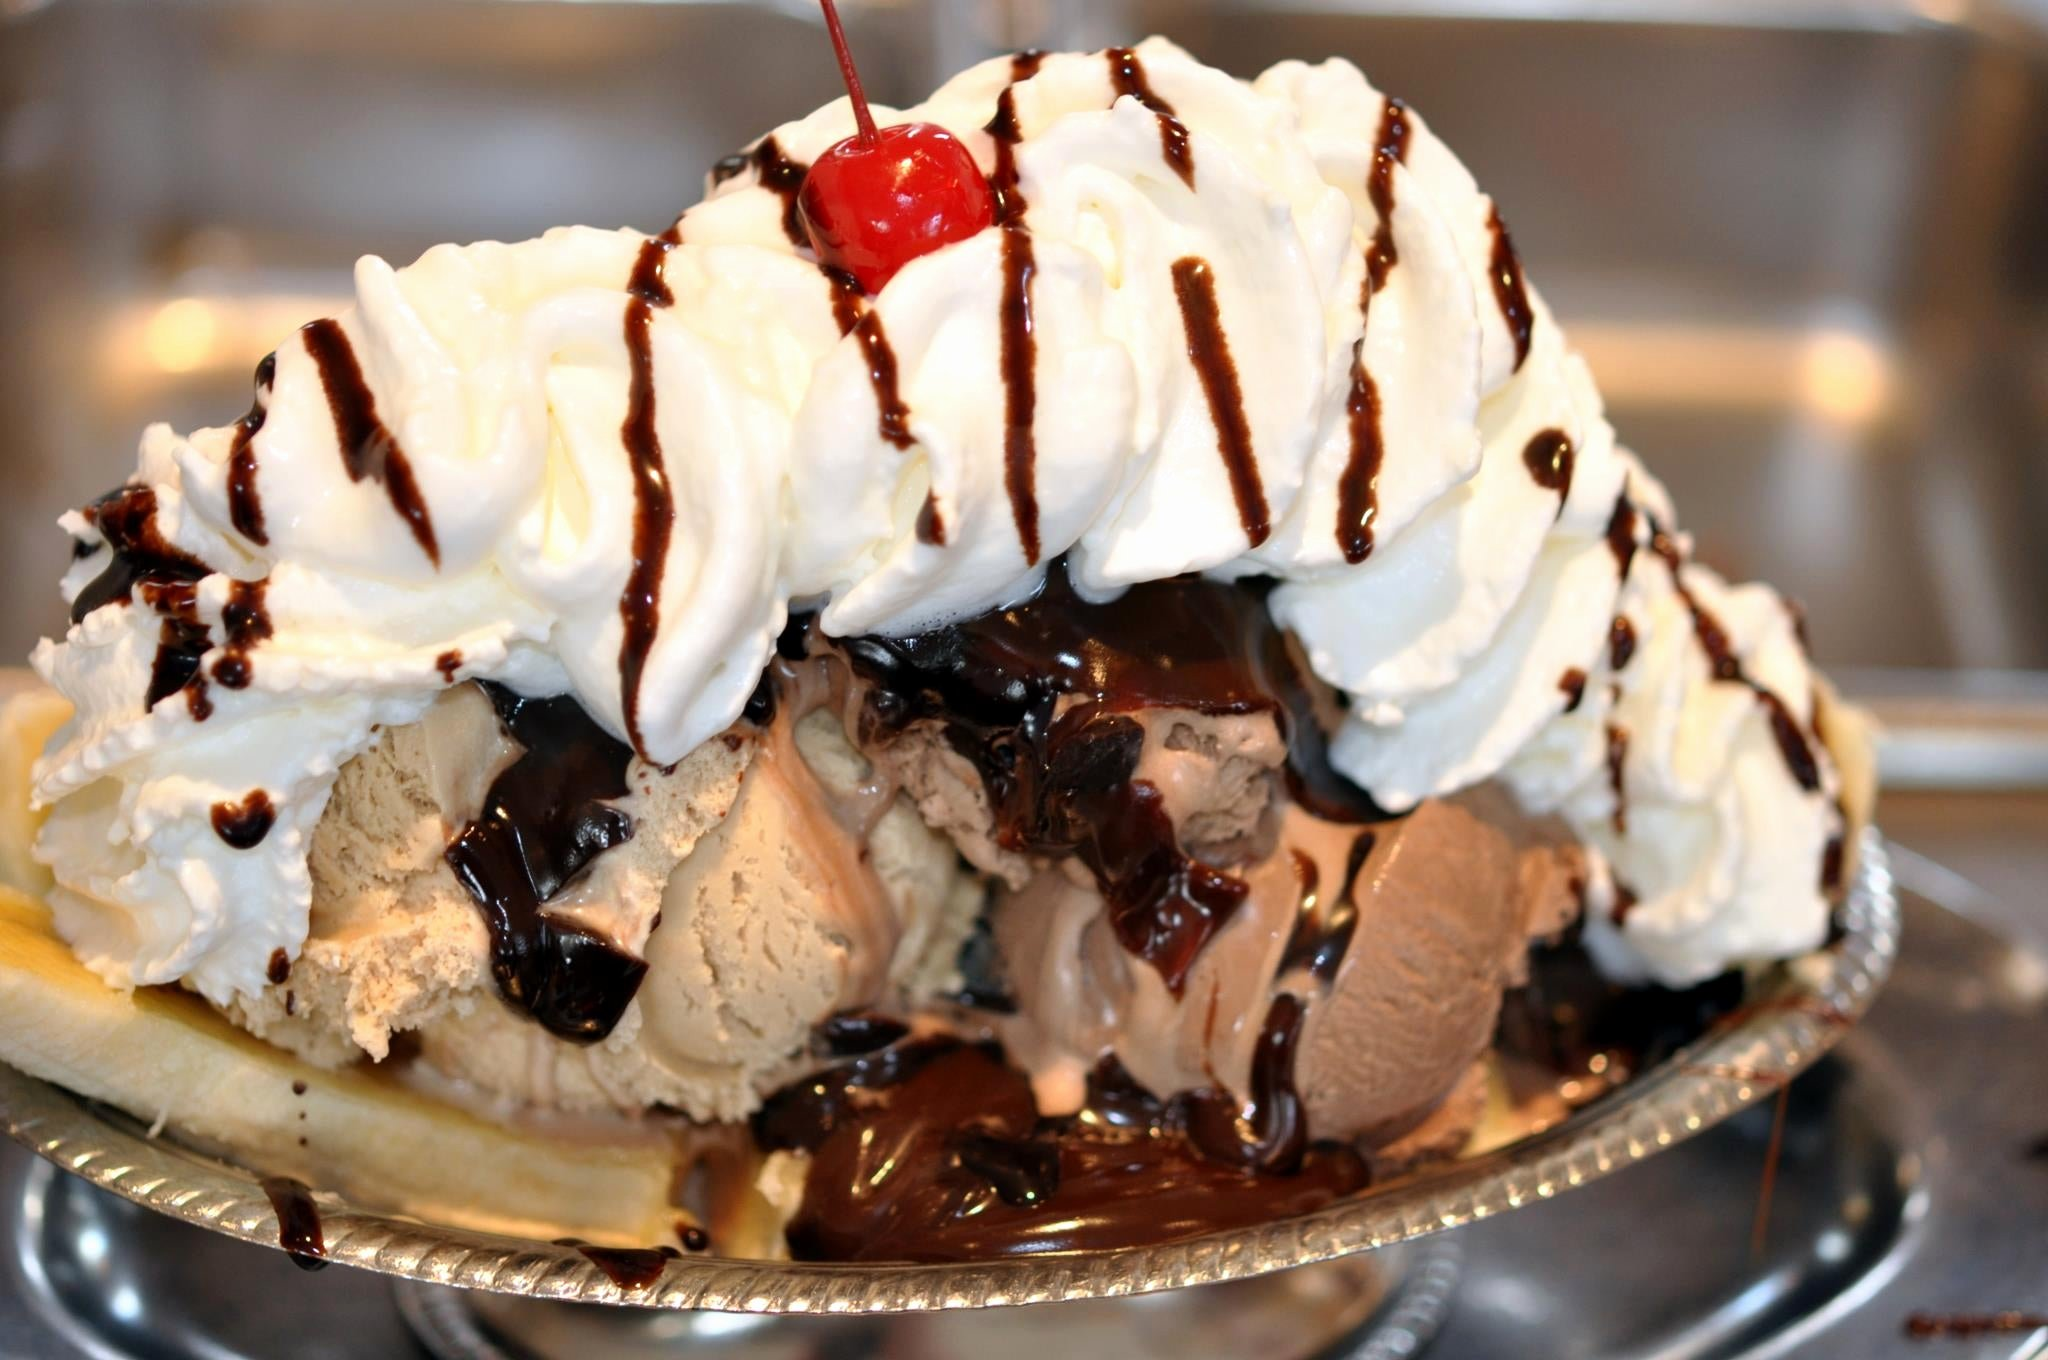 Ice Cream Restaurants Logos Elegant Cabot S Ice Cream & Restaurant at 743 Washington St at Central Ave Newton Ma